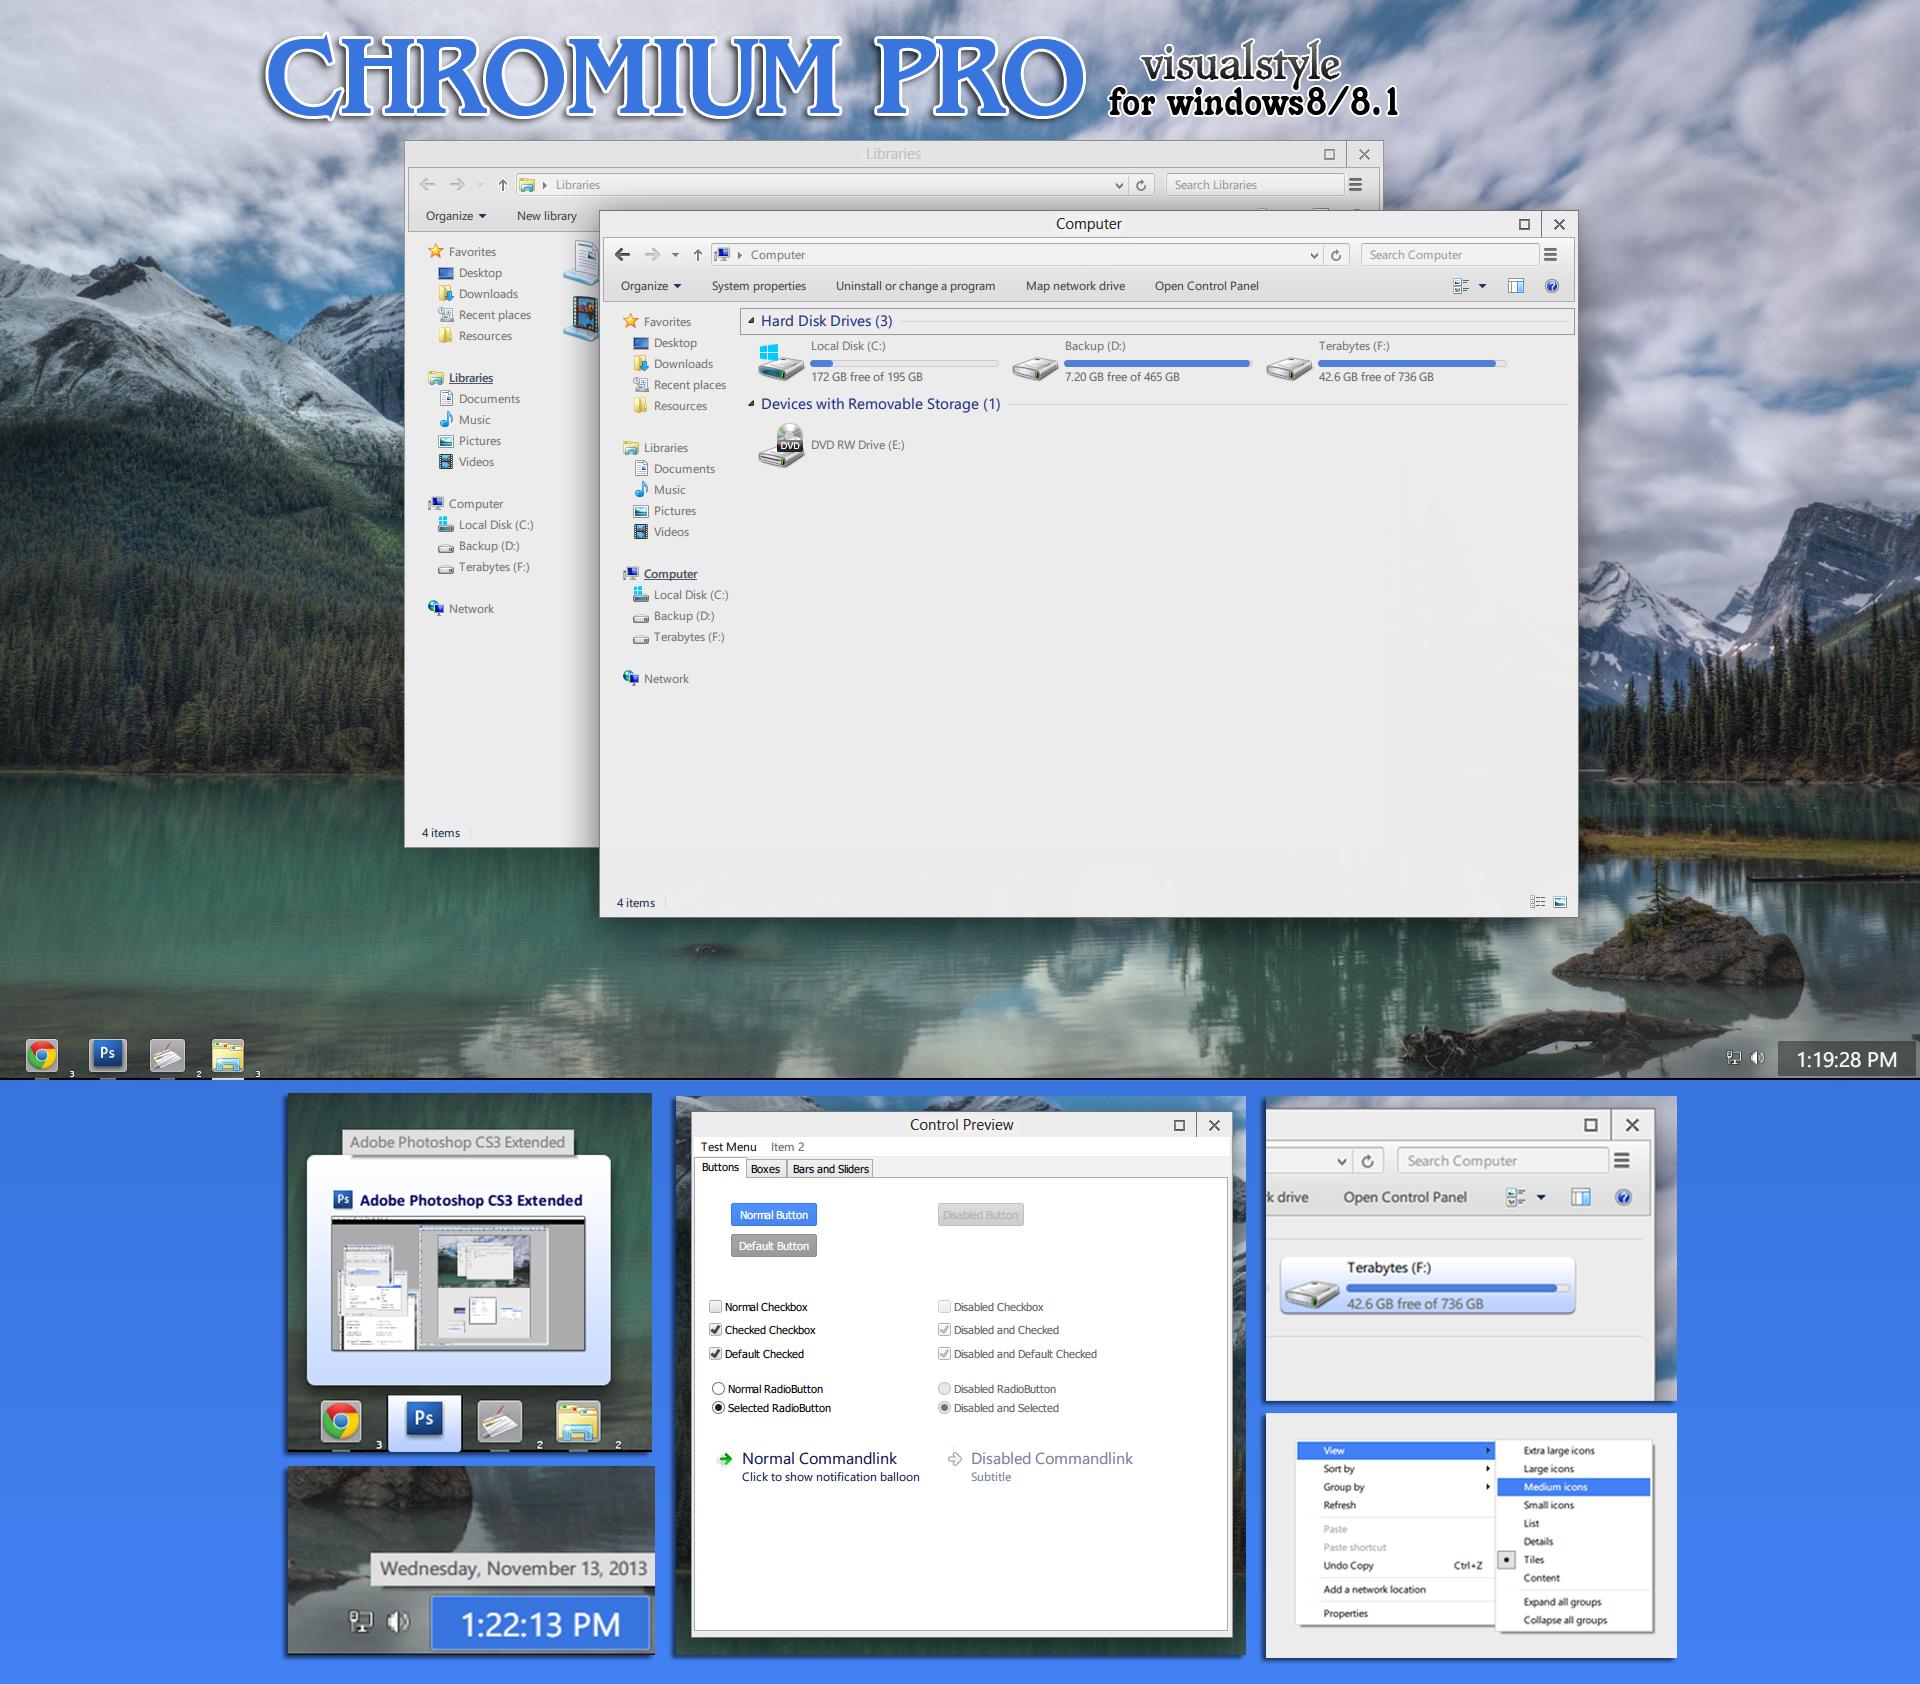 Chromium Pro vs (beta1) for windows 8/8.1 by RaymonVisual